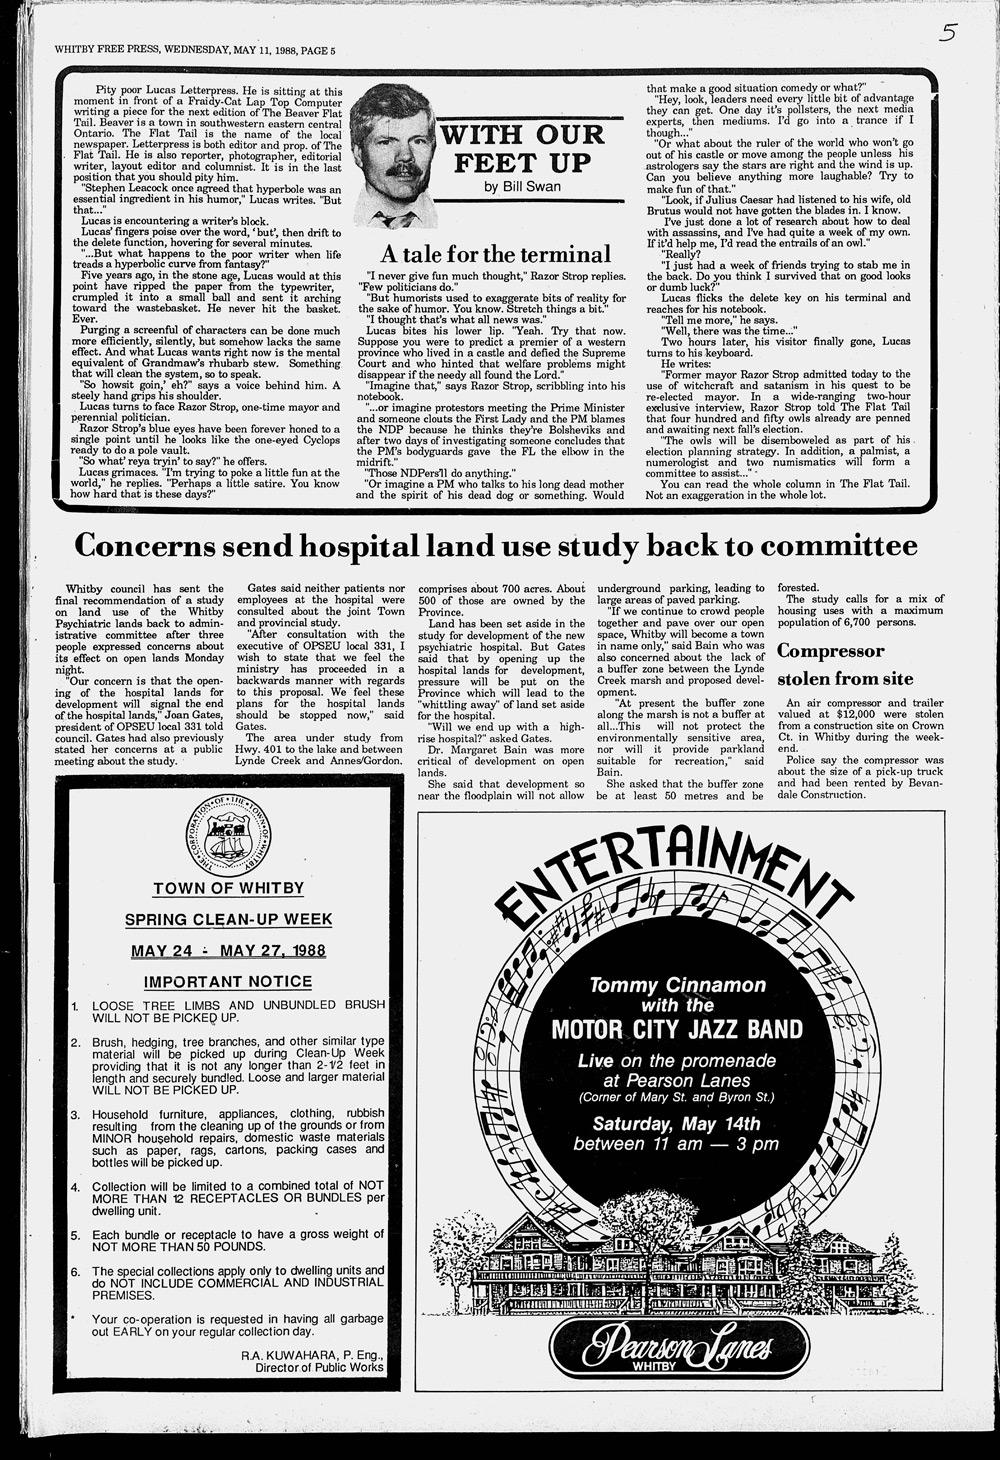 Whitby Free Press, 11 May 1988